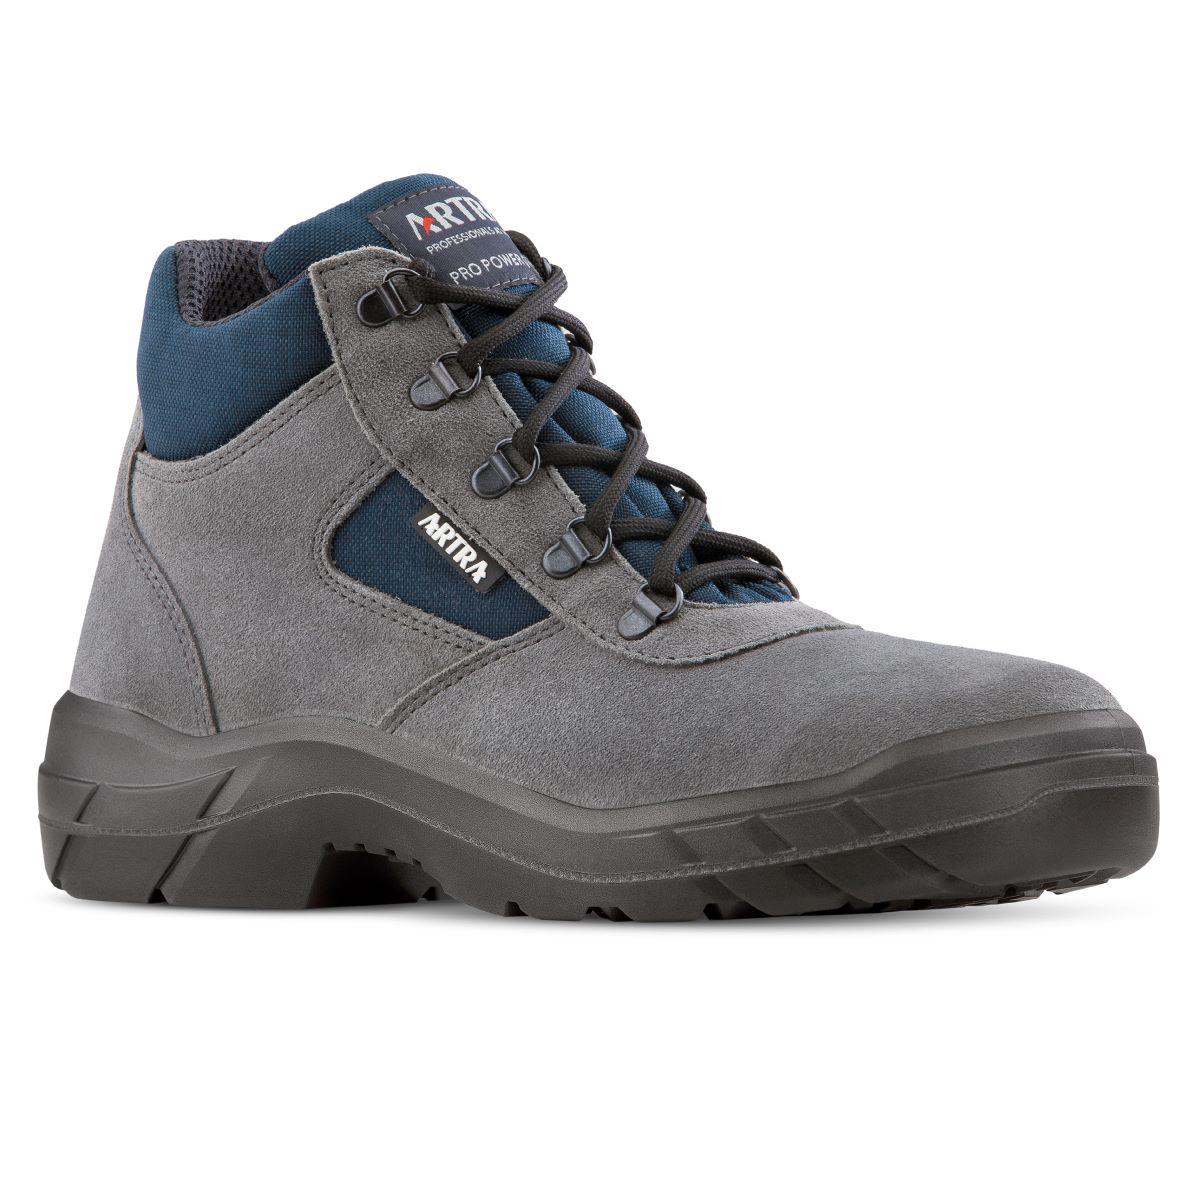 030943 ARCHER zateplená obuv prac. 39